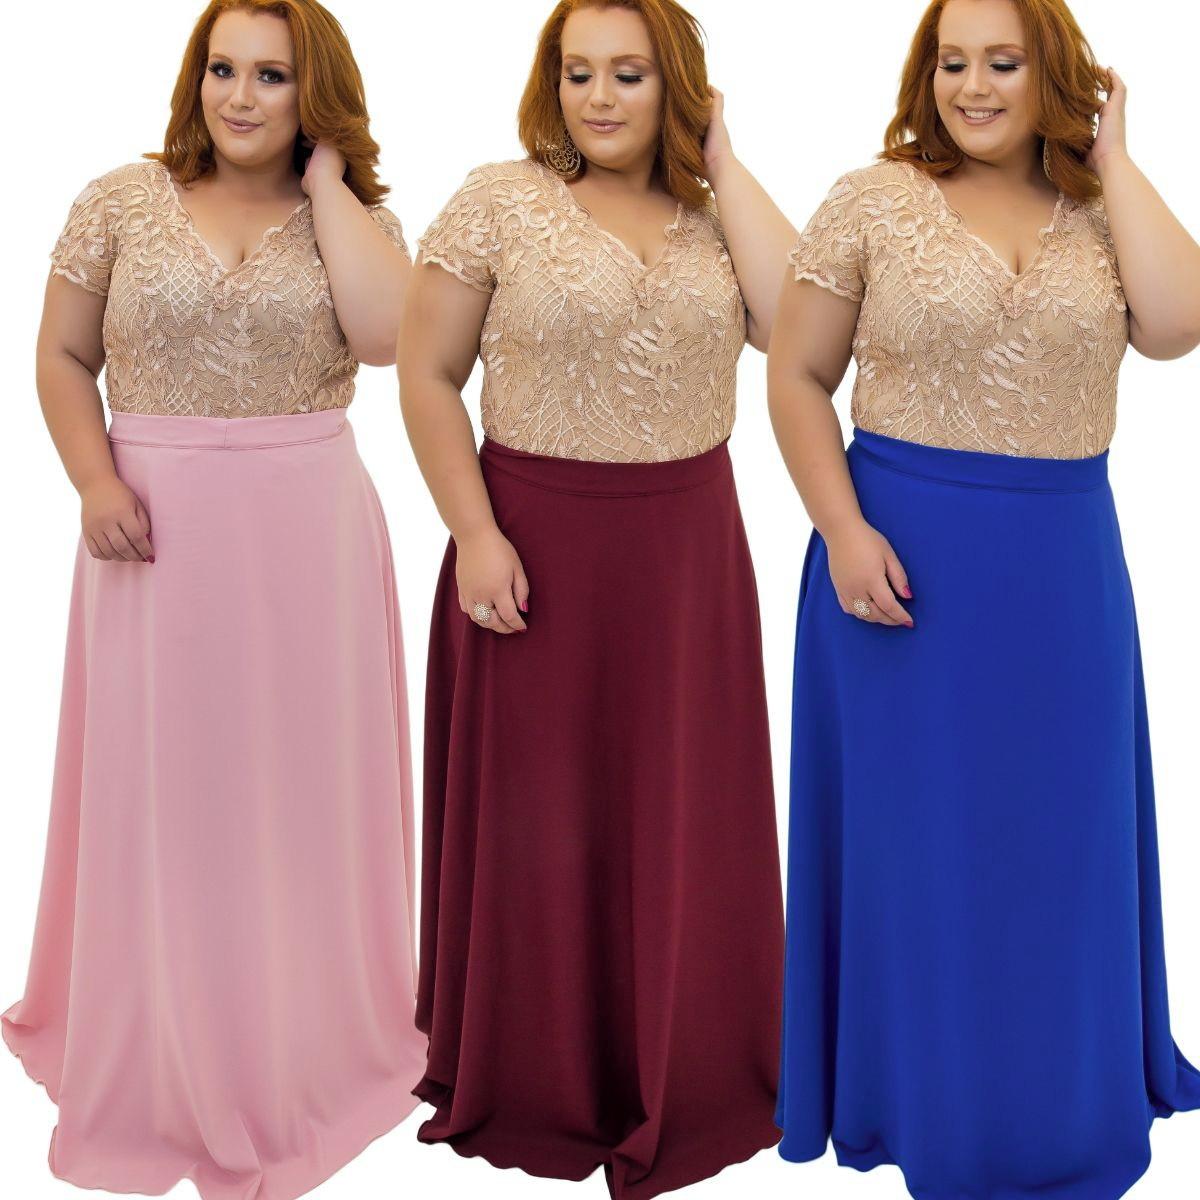 Vestido Festa Plus Size Luxo Madrinha Formatura Mãe Da Noiva